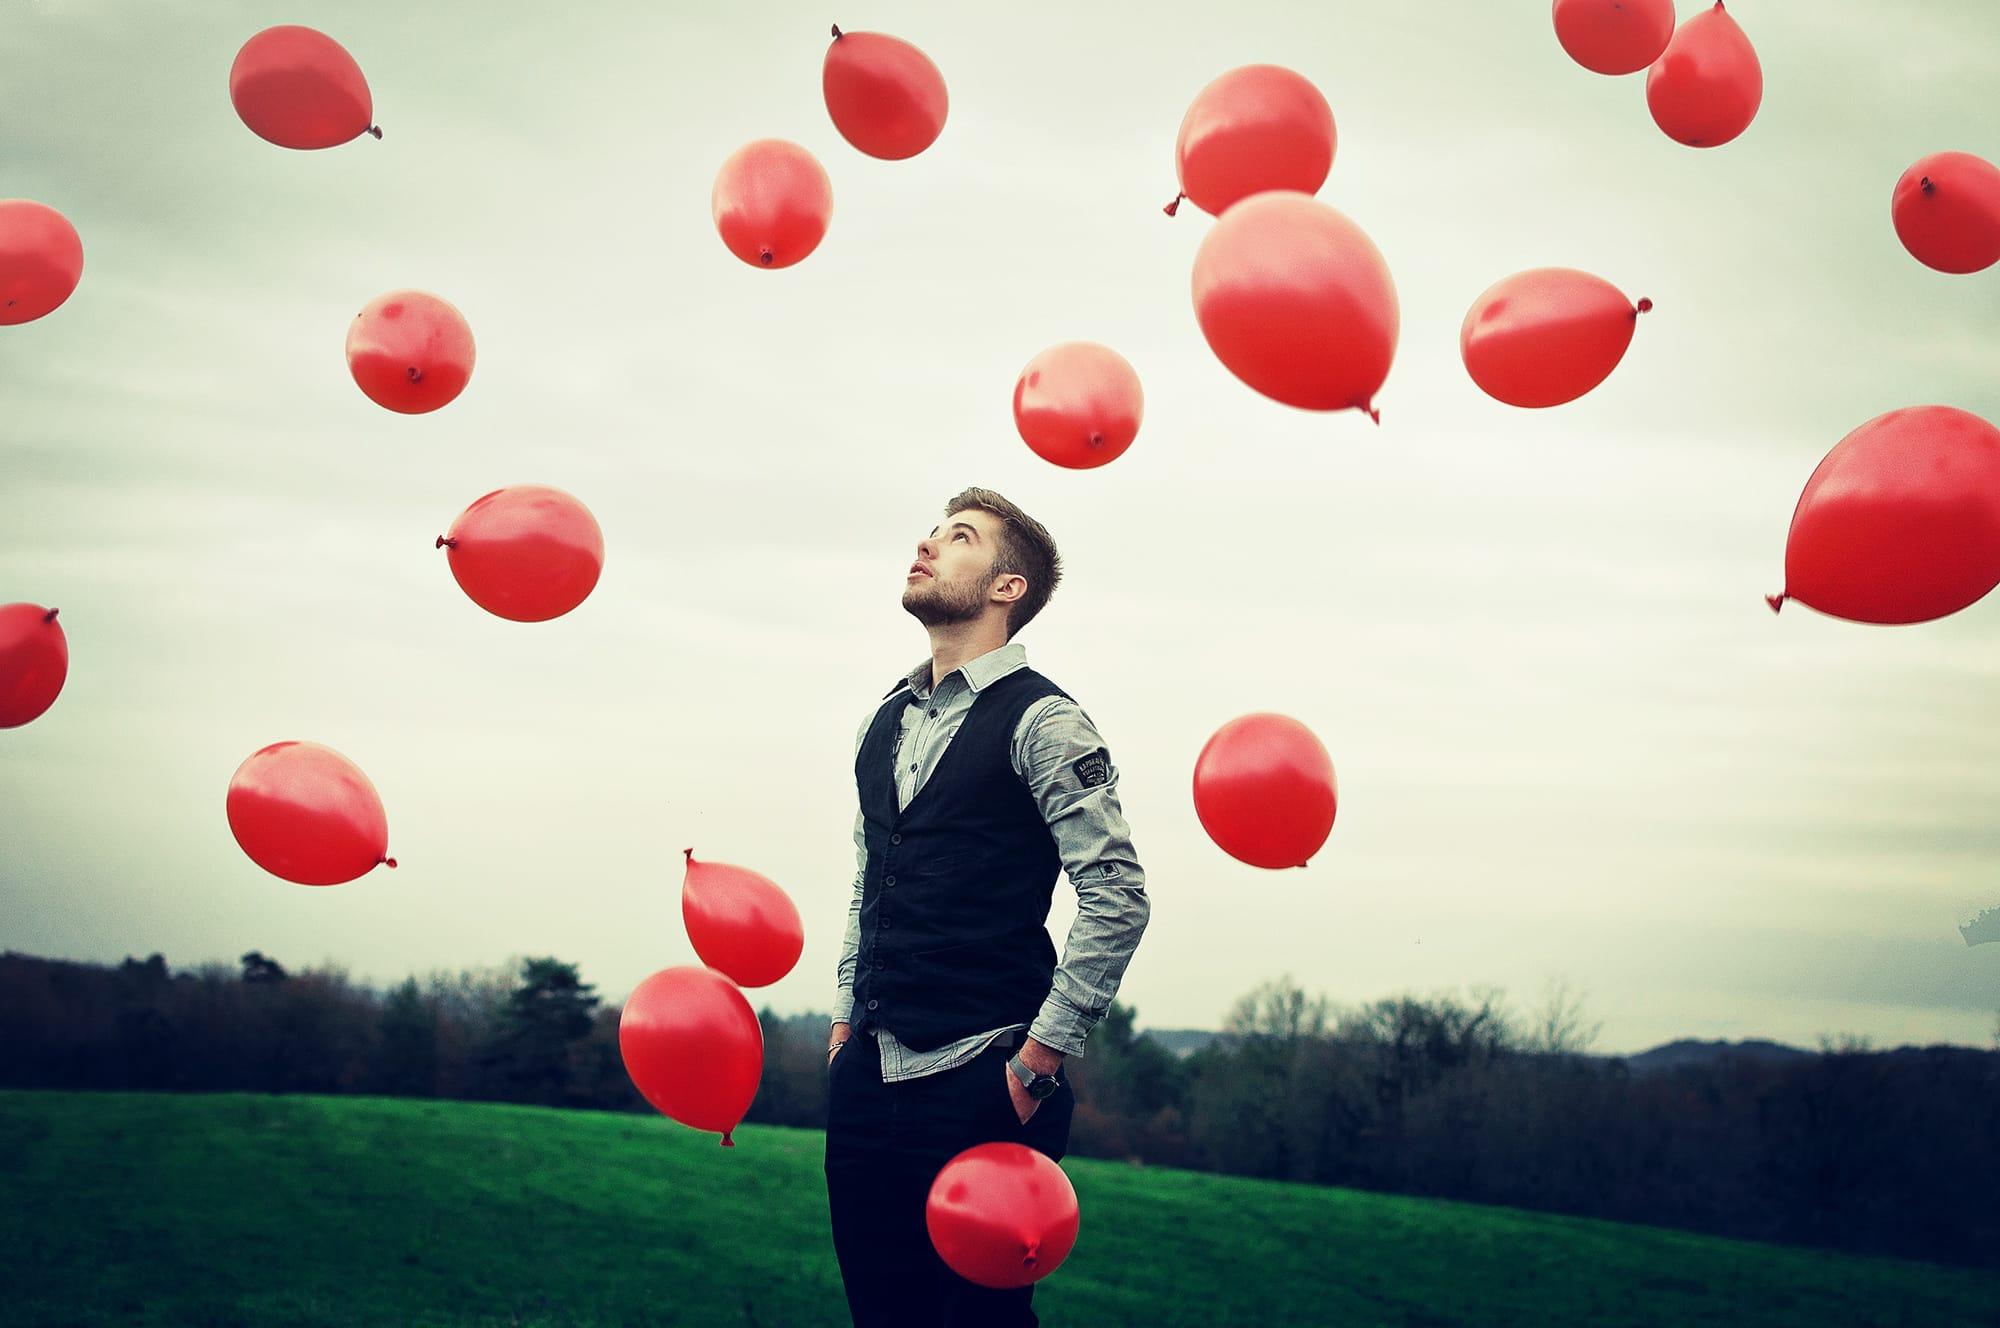 man-balloons